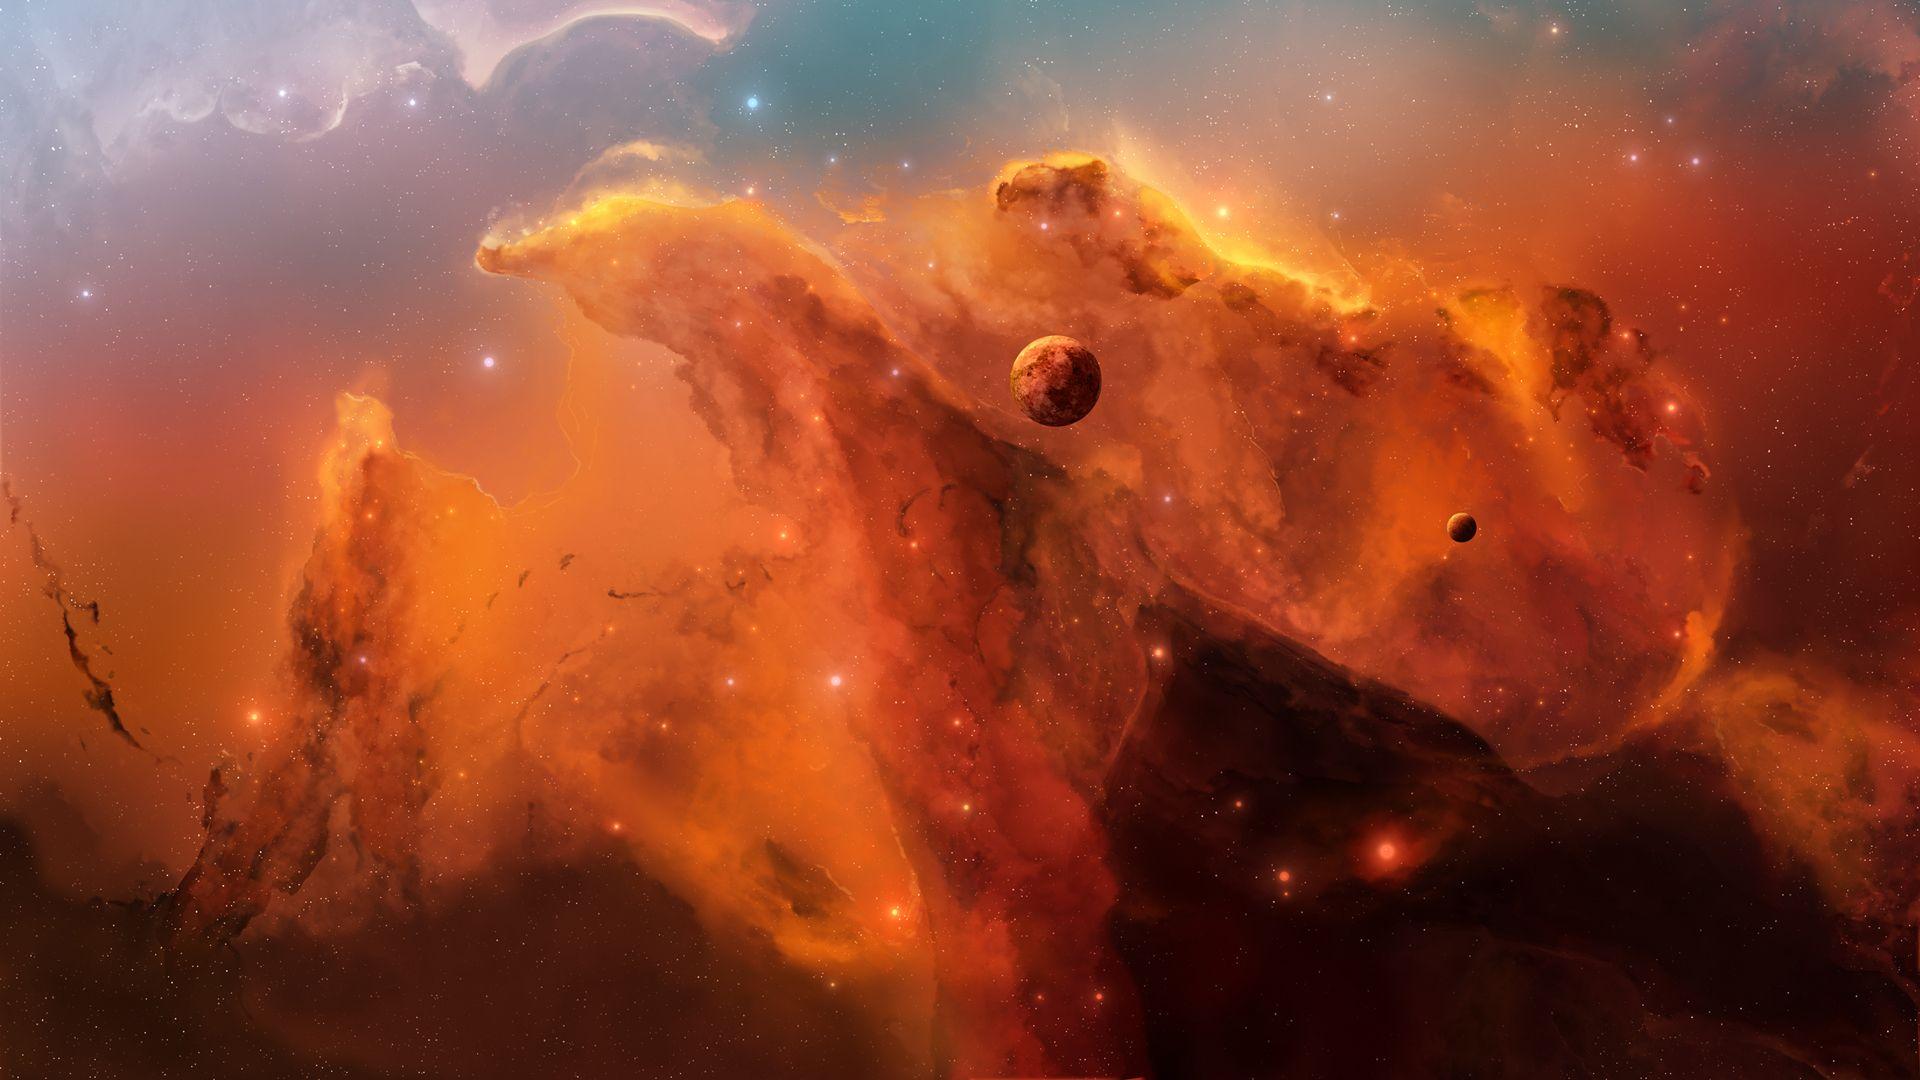 Space Nebula Wallpaper